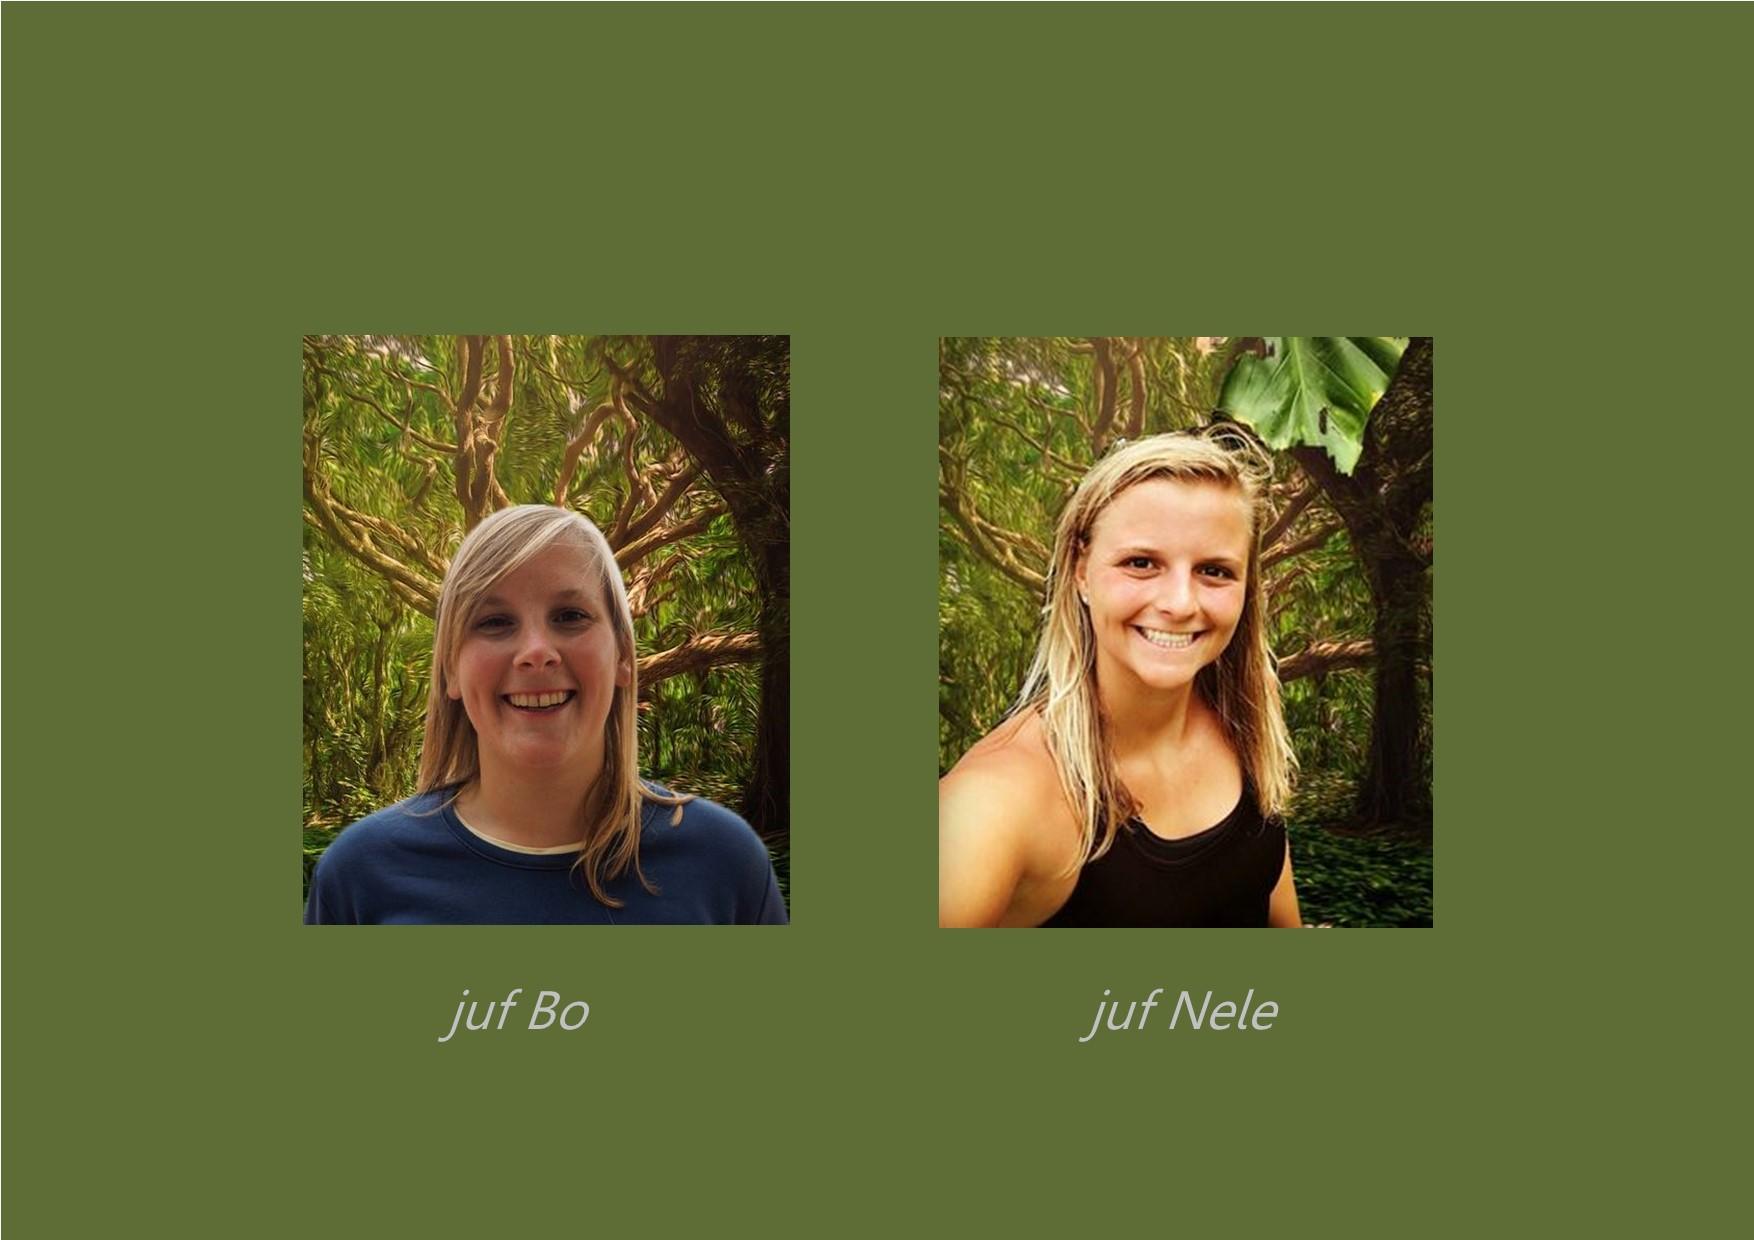 <p>bewegingsopvoeding: juf Bo en juf Nele</p>